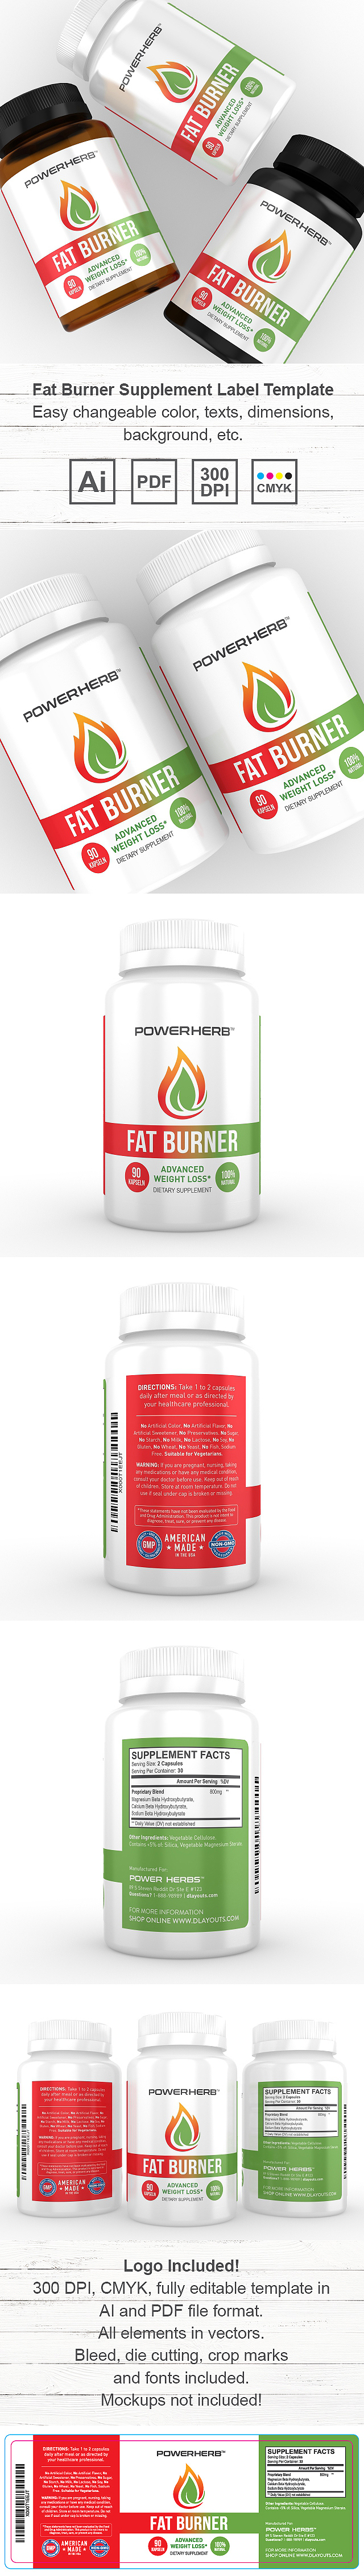 Fat Burner Supplement Label Template